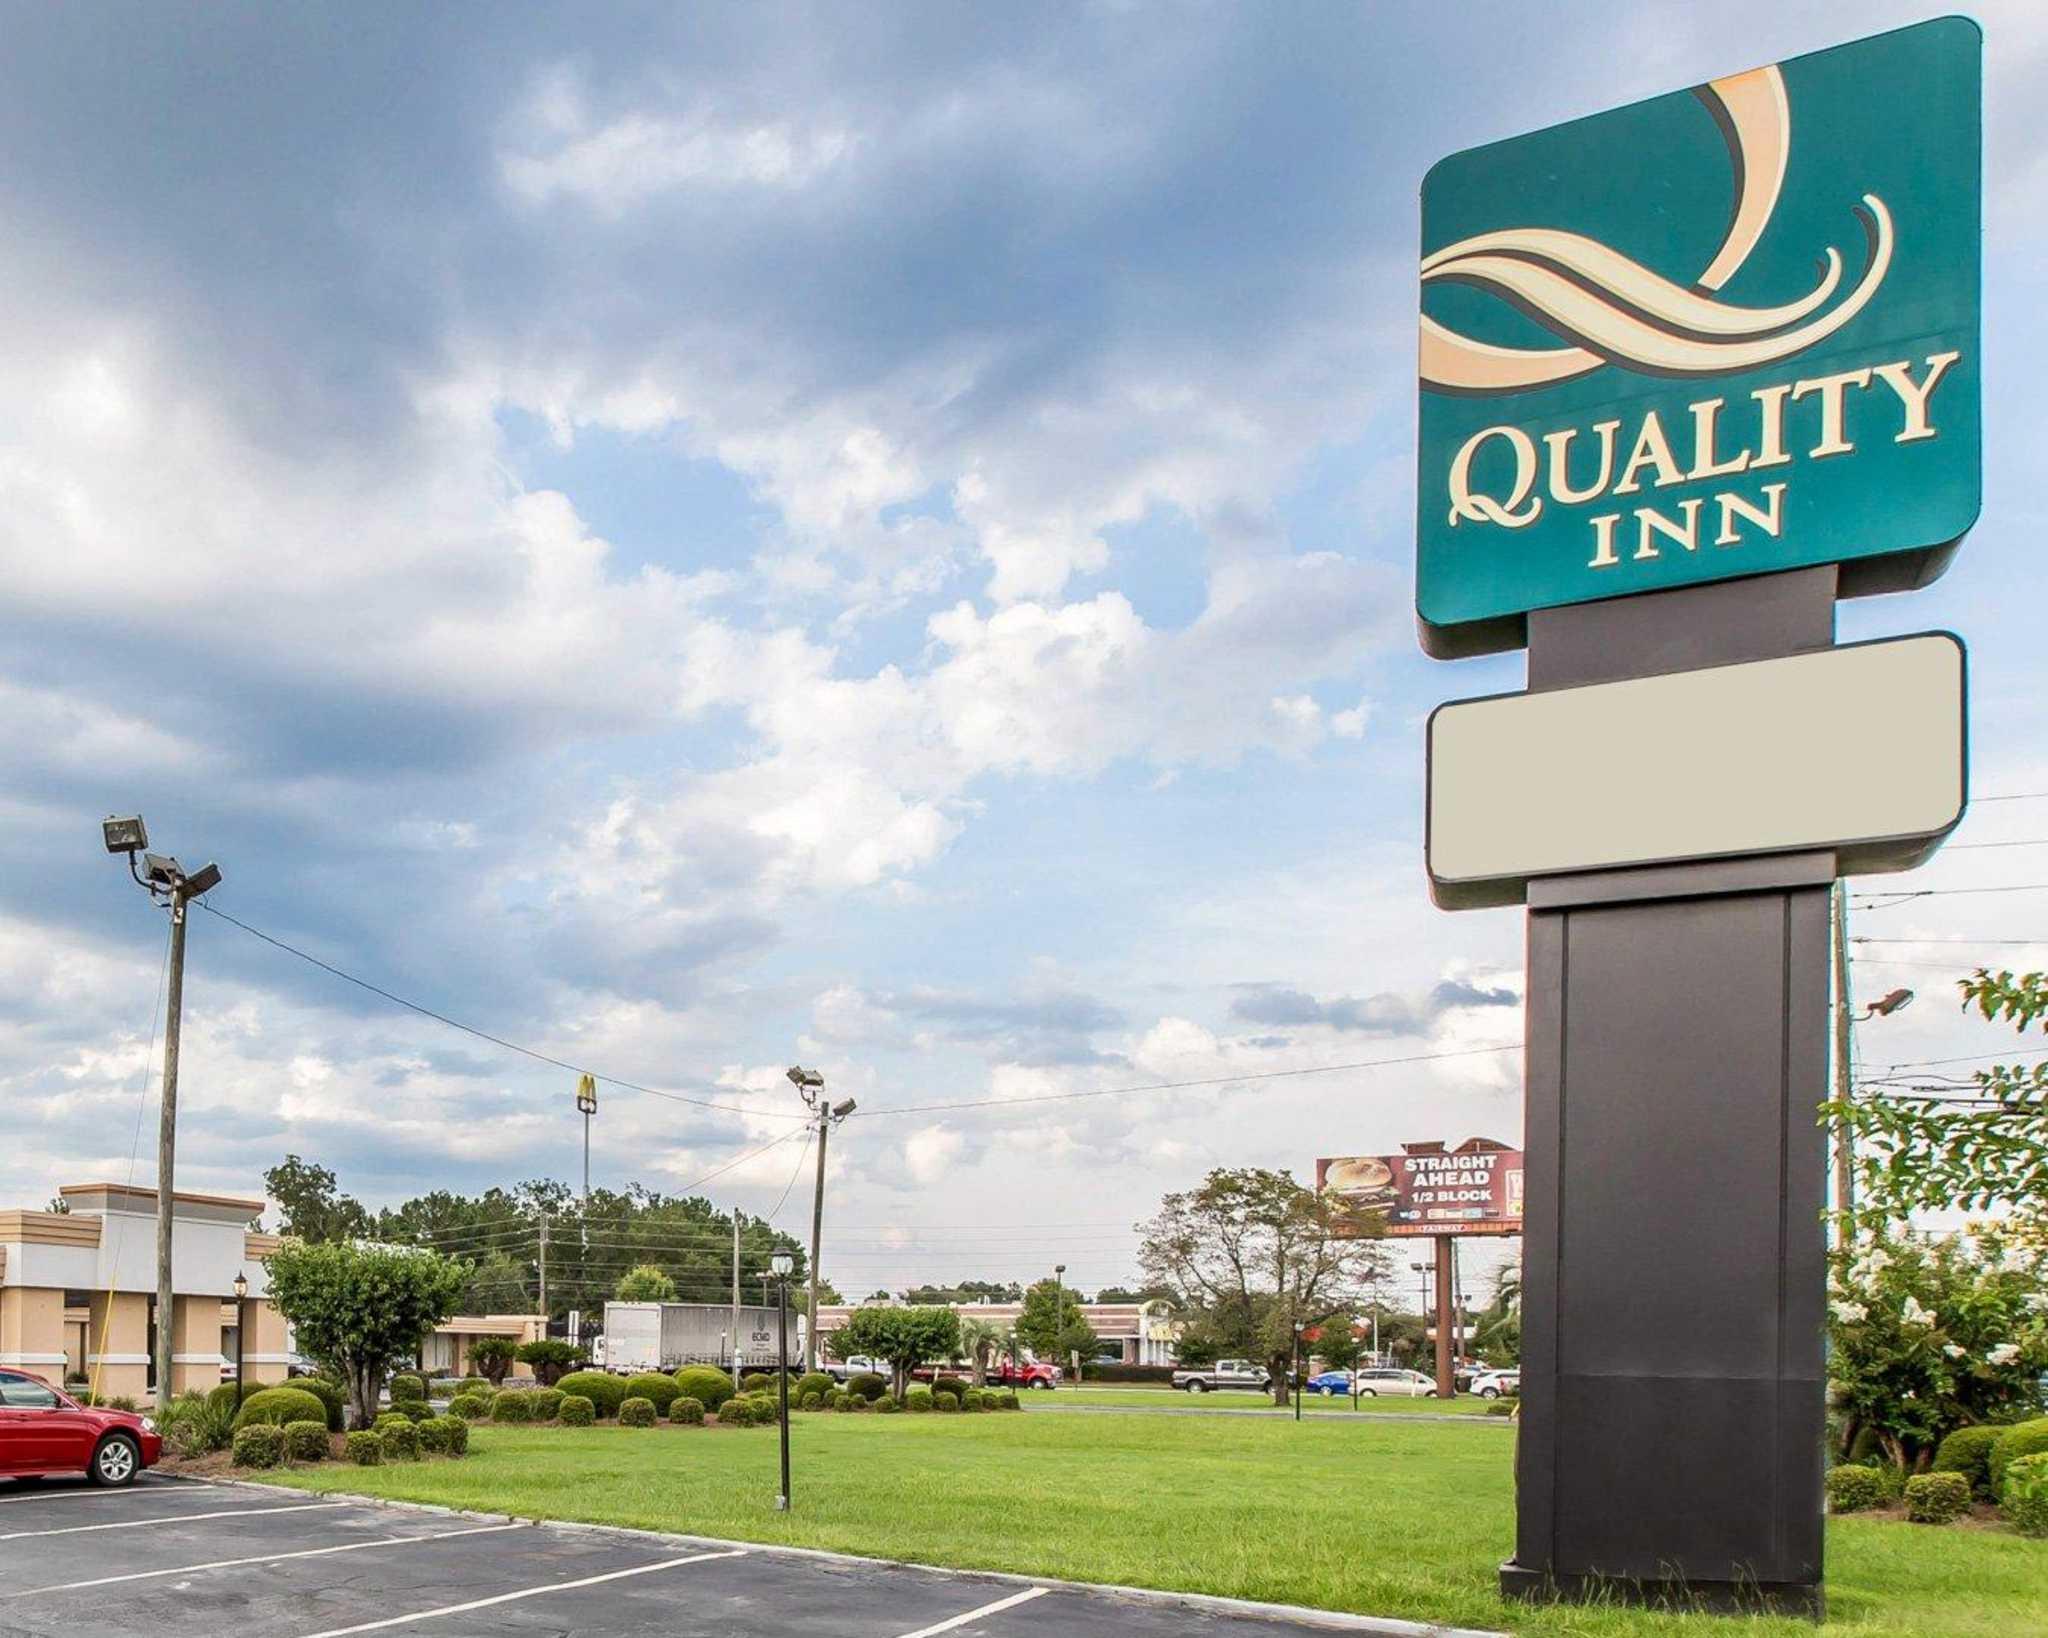 Quality Inn South image 1